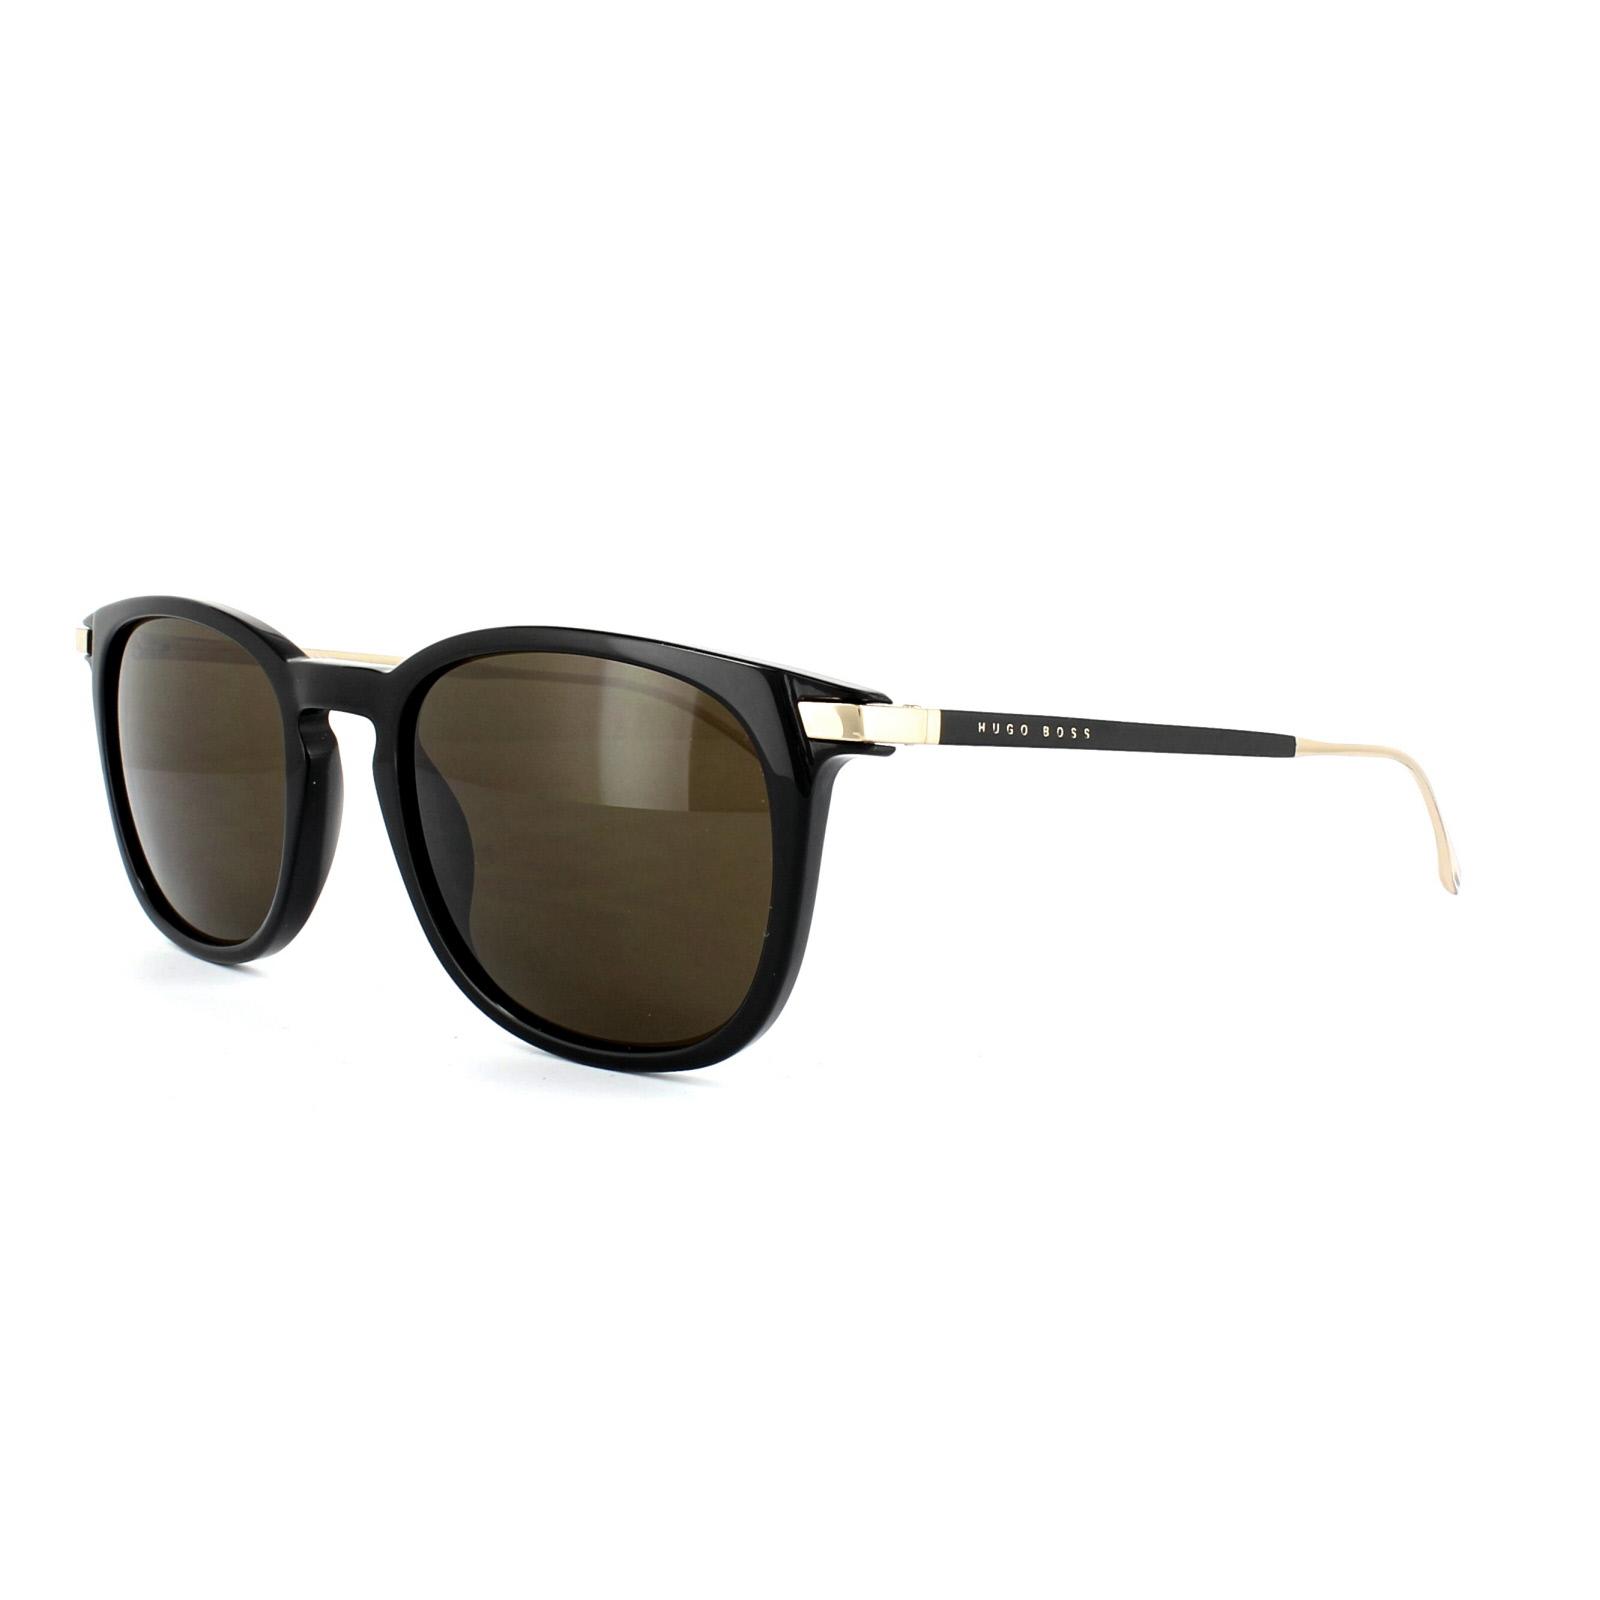 Boss Boss 0783/S 263 51 black semi matte black gold / brown nQyEYJ